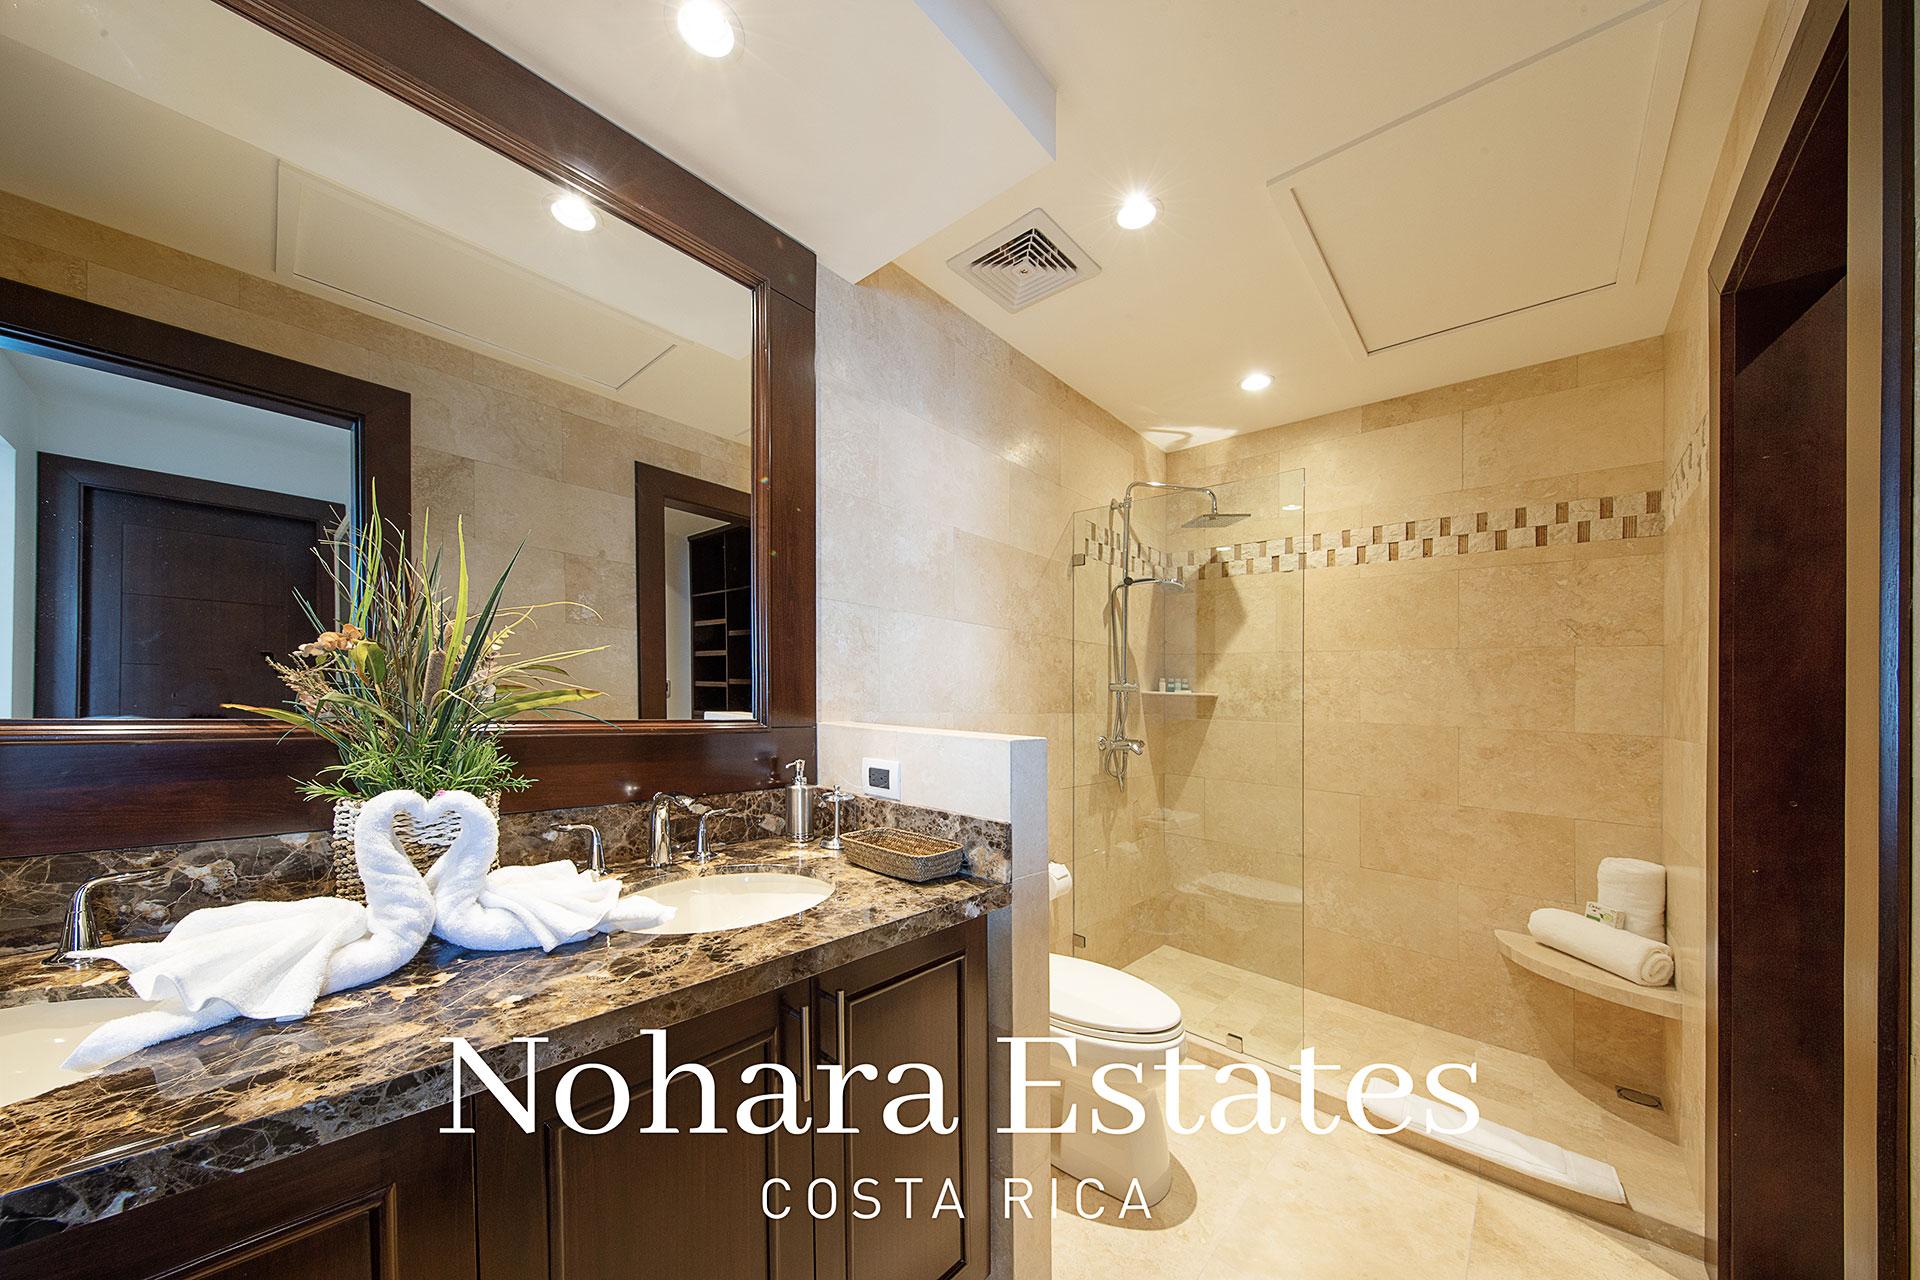 Nohara Estates Costa Rica 360 Esplendor Del Pacifico 5